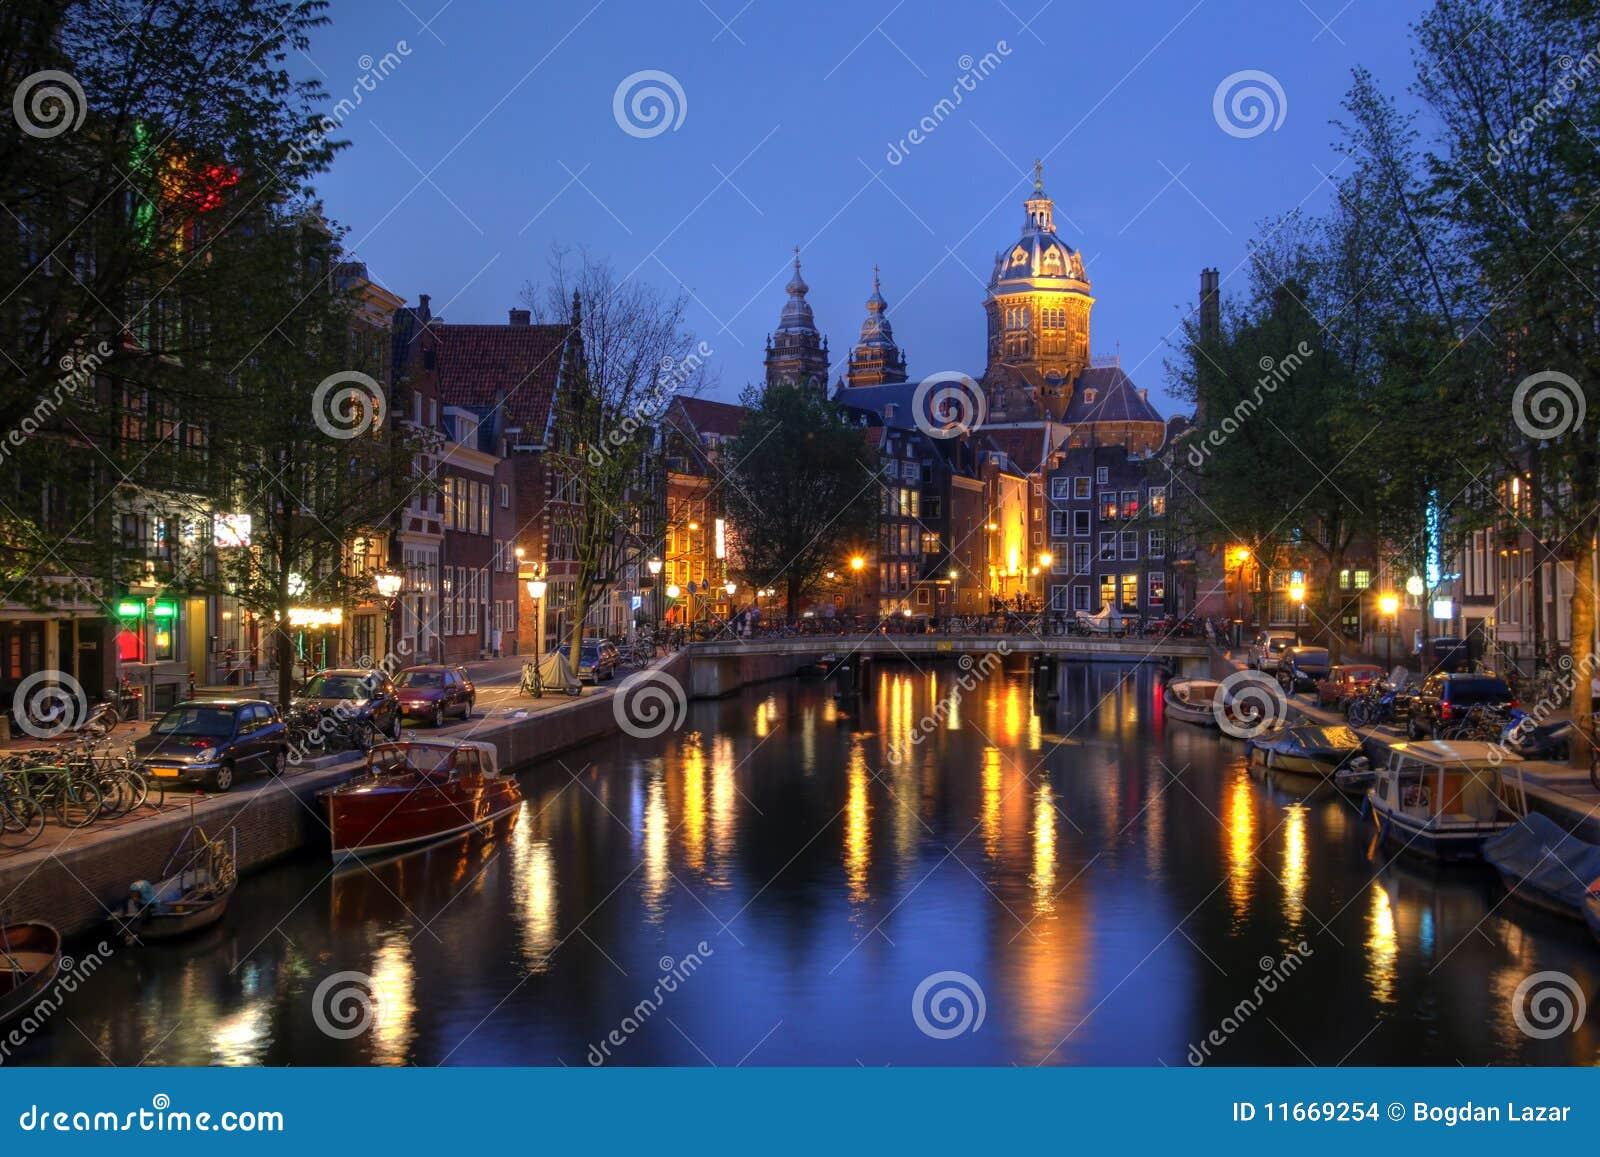 St. Nicholas Church in Amsterdam, The Netherlands